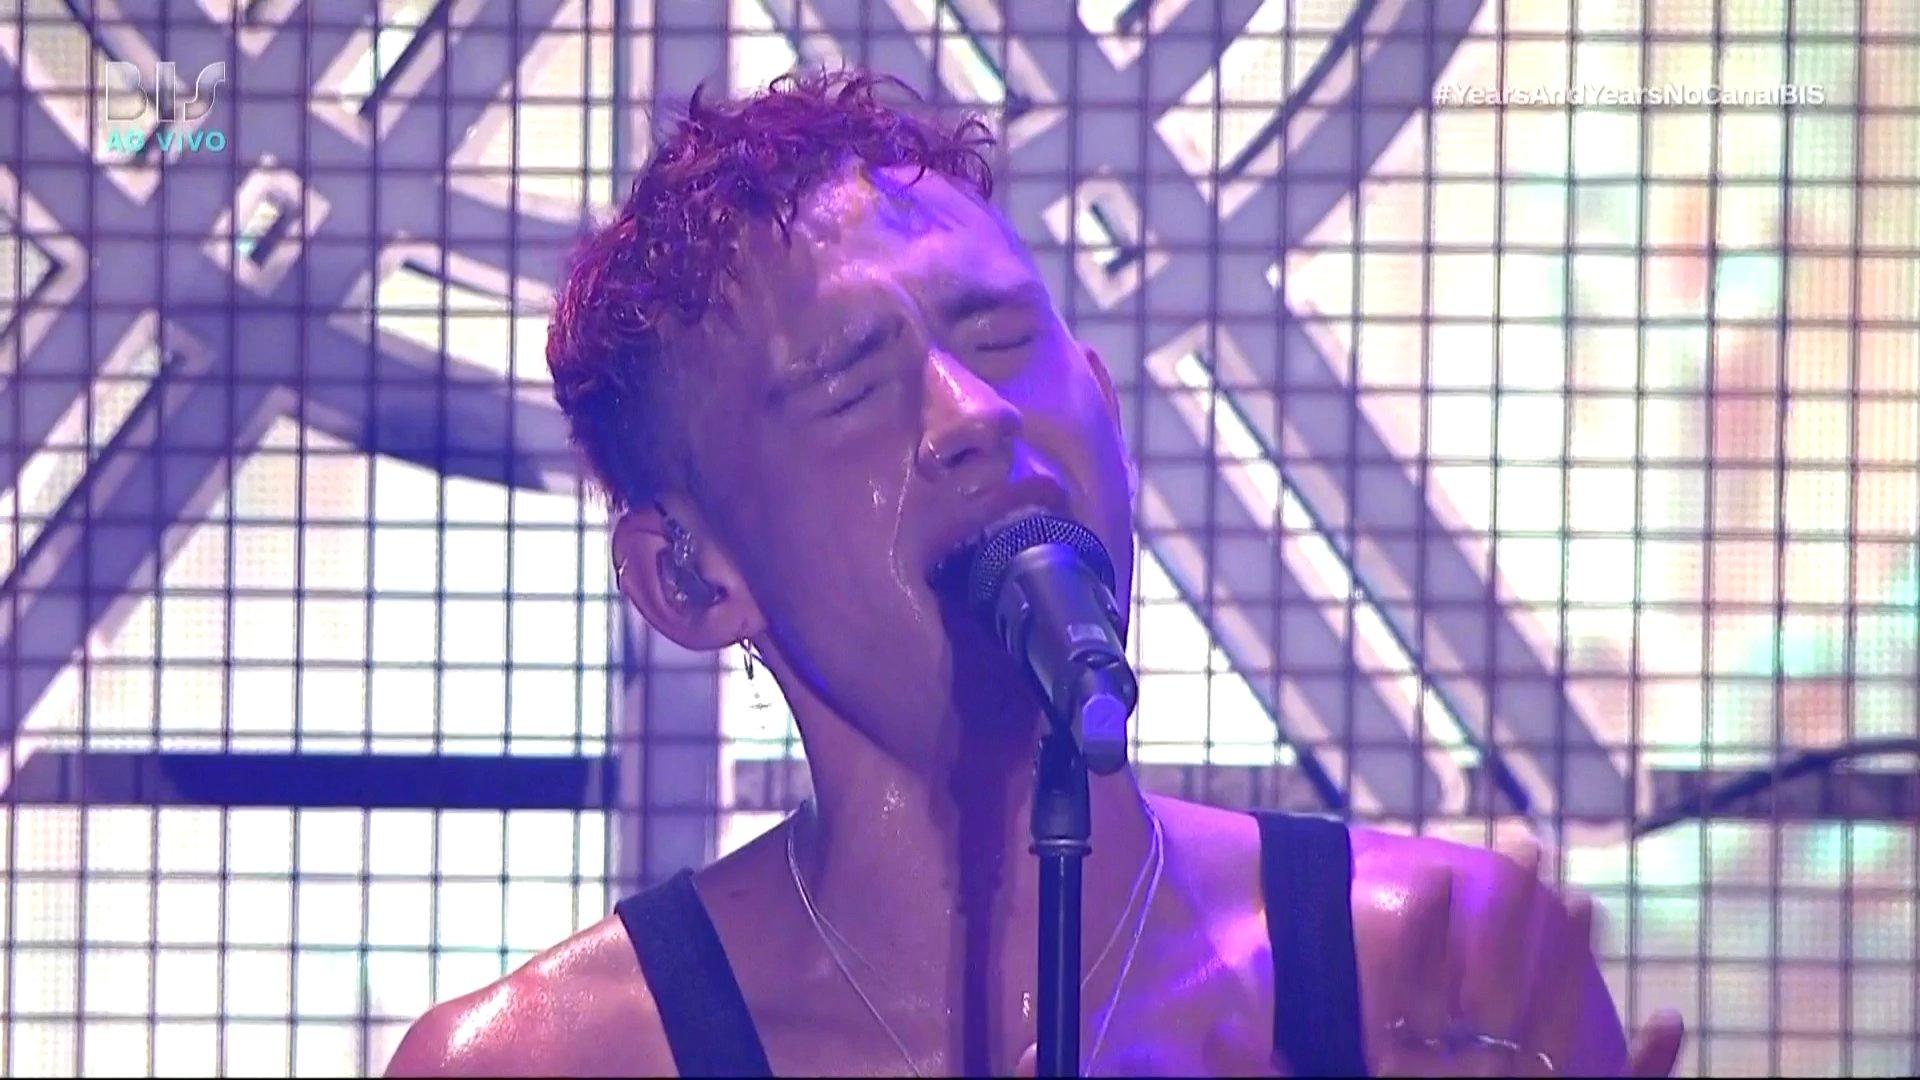 Lollapalooza Brazil 2019 [12 x HDTV, 1080i/1080p]